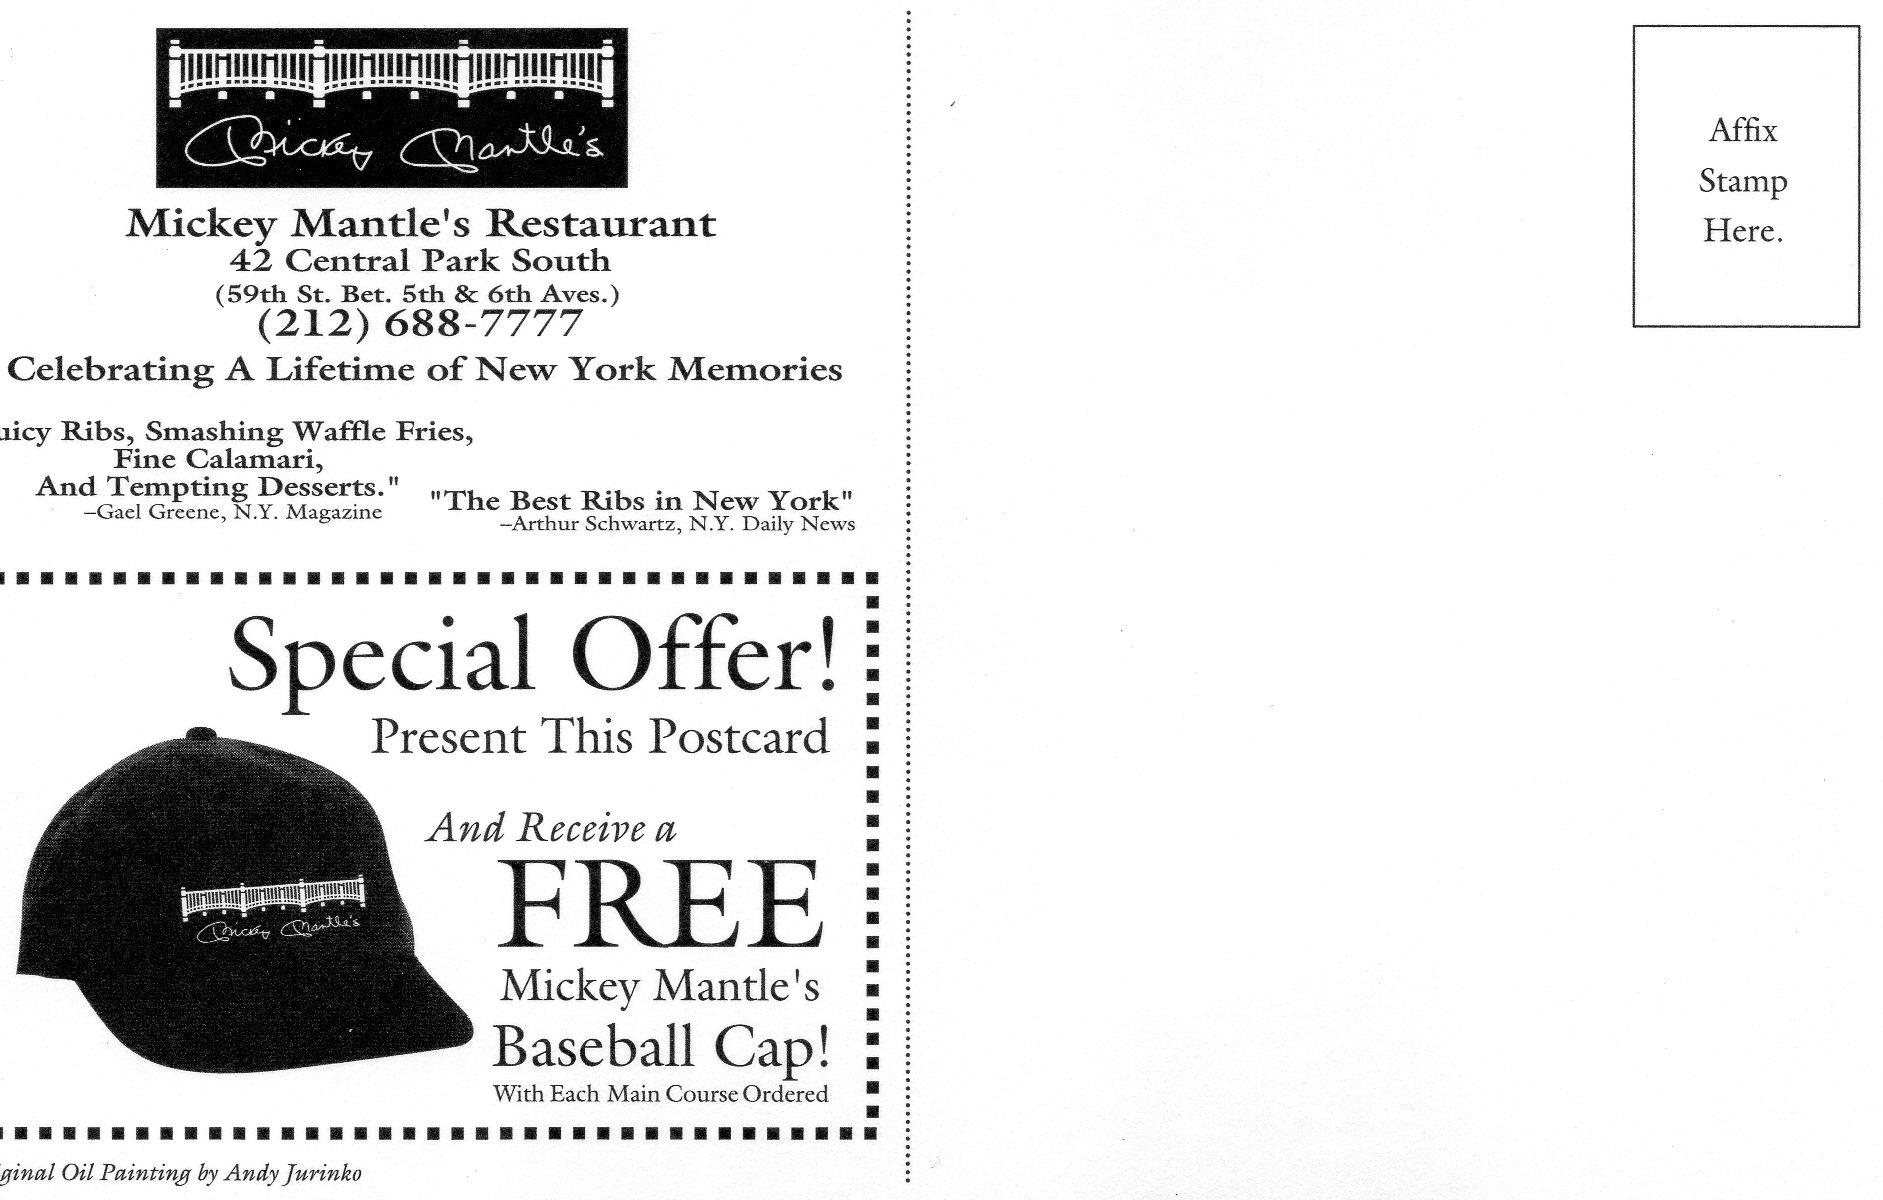 1990 era postcard